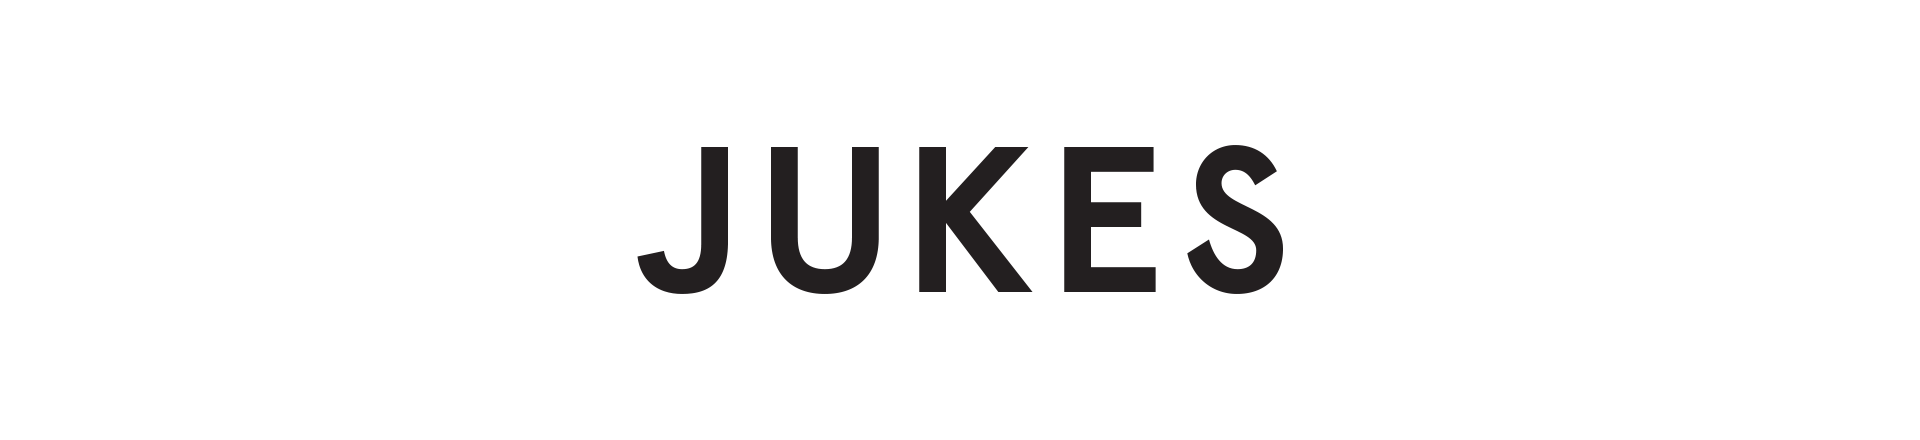 Jukes_Black (1).png